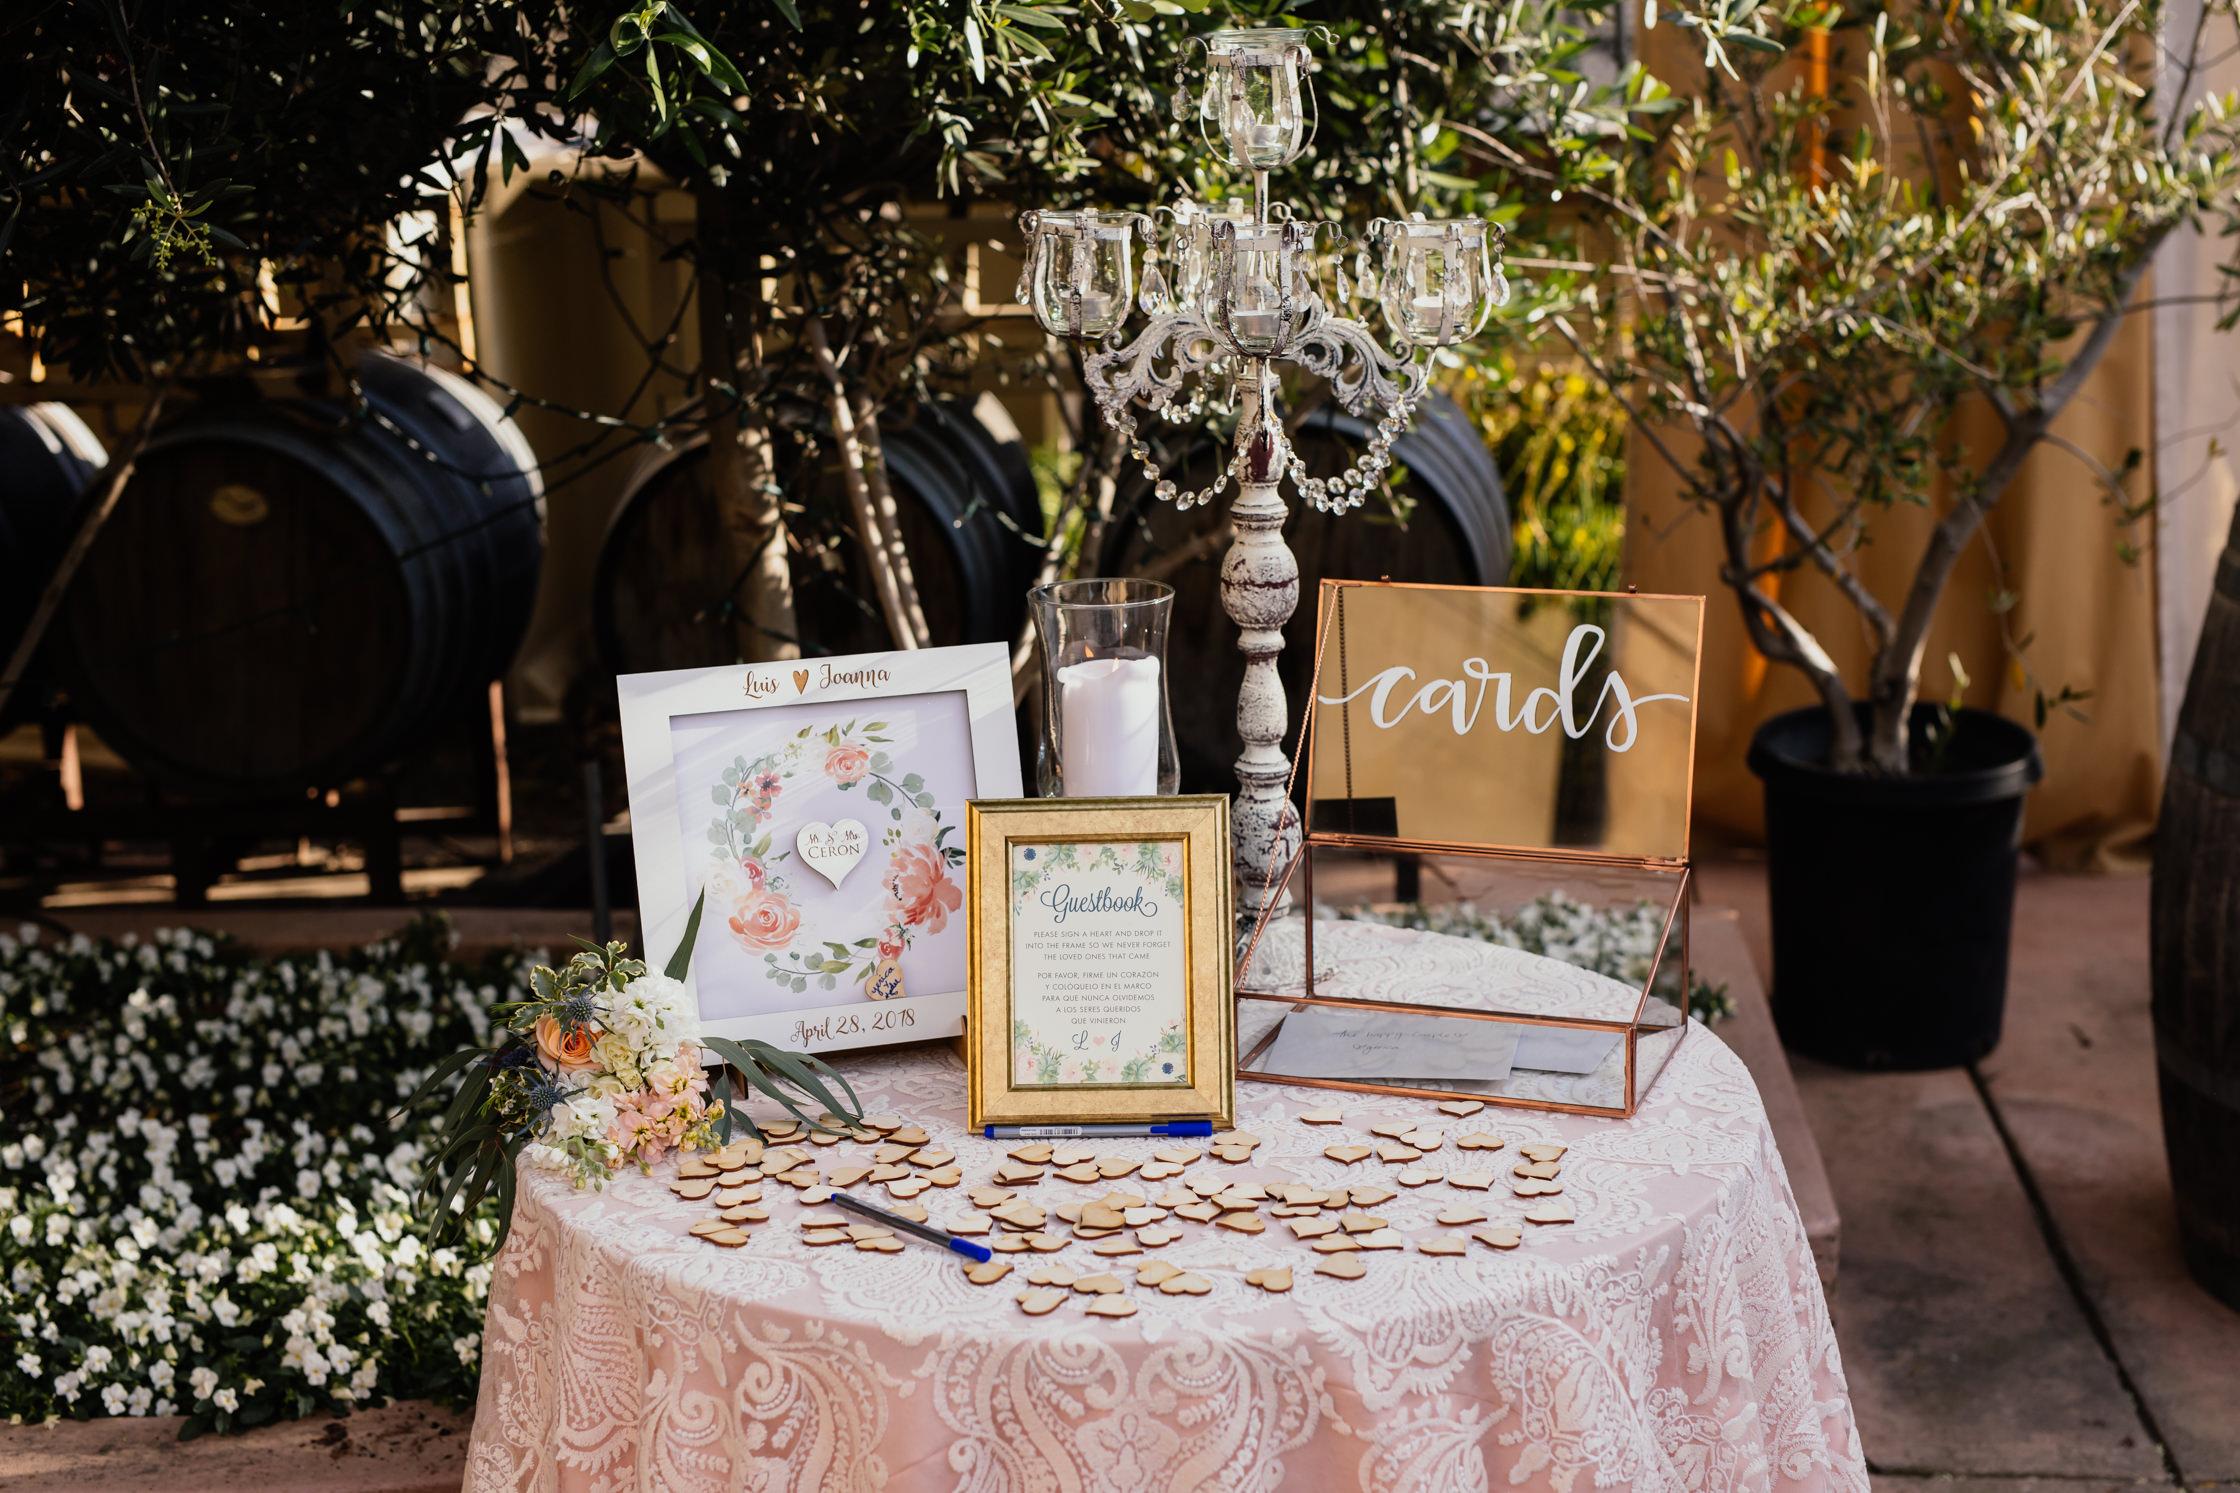 luis_joanna_wedding-76.jpg